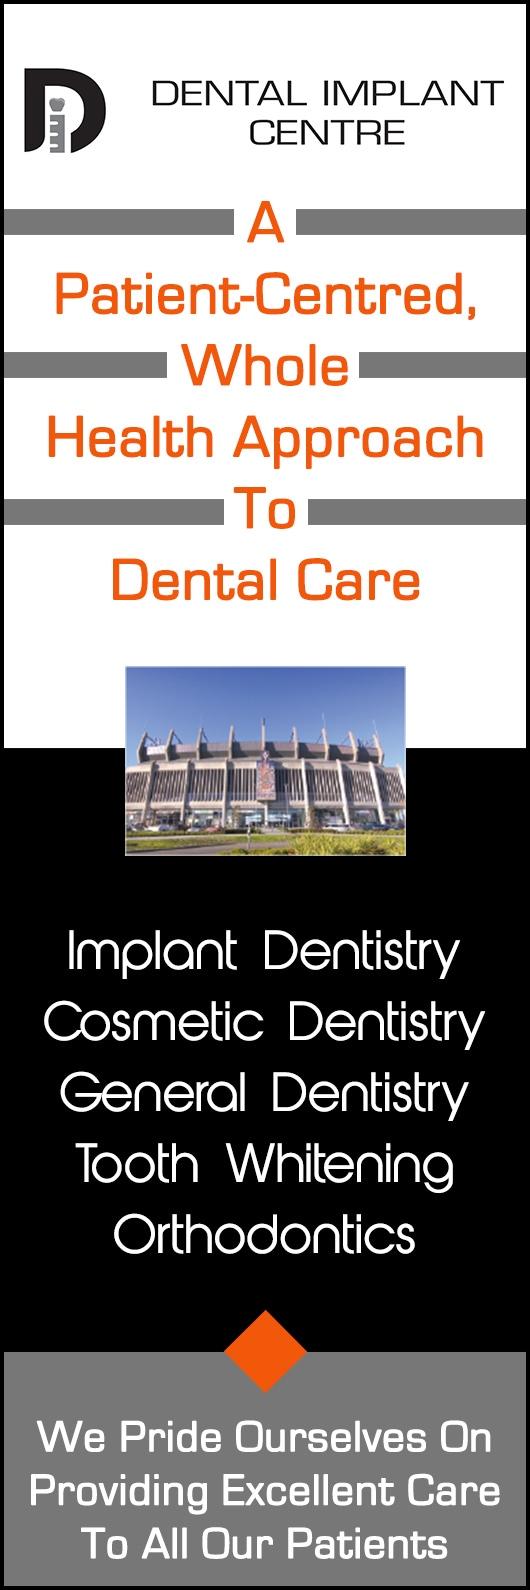 Dental Implant Quotes Di Dental Implant Centre  Dentist  327 Gladstone Rd  North